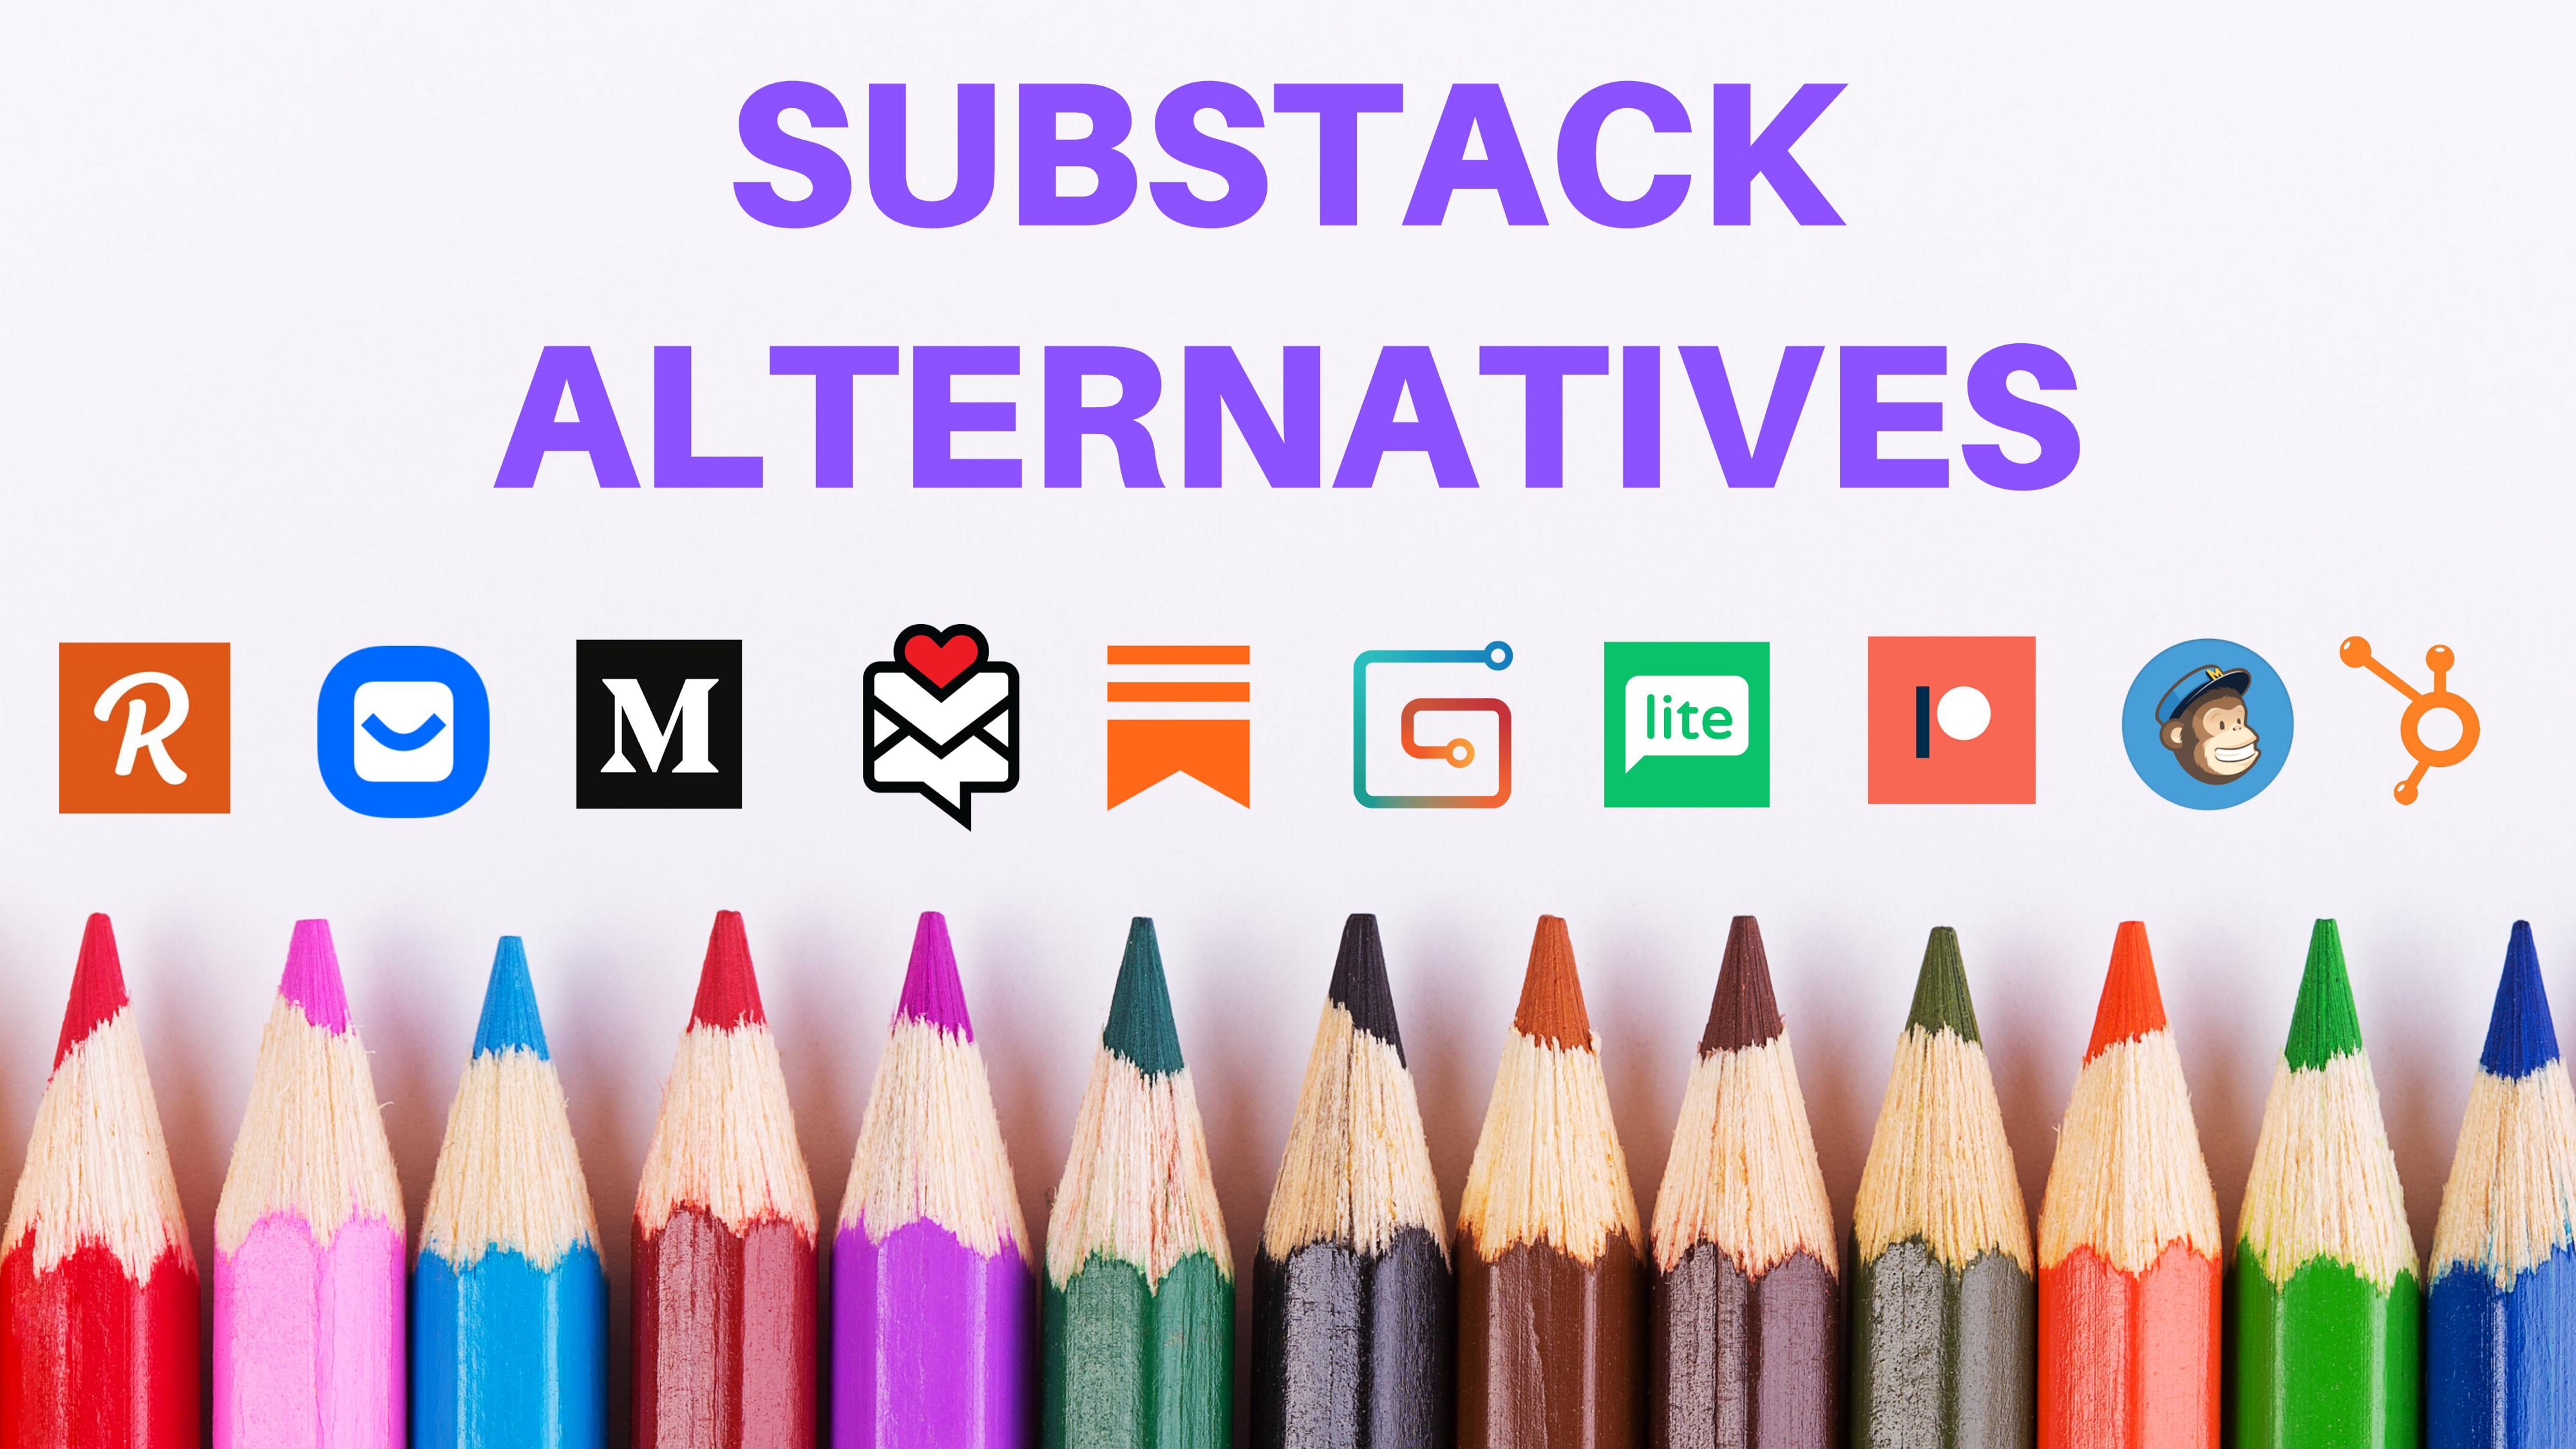 substack alternatives, substack competitors, substack vs revue, tinyletter vs substack, ghost vs substack, casey botticello